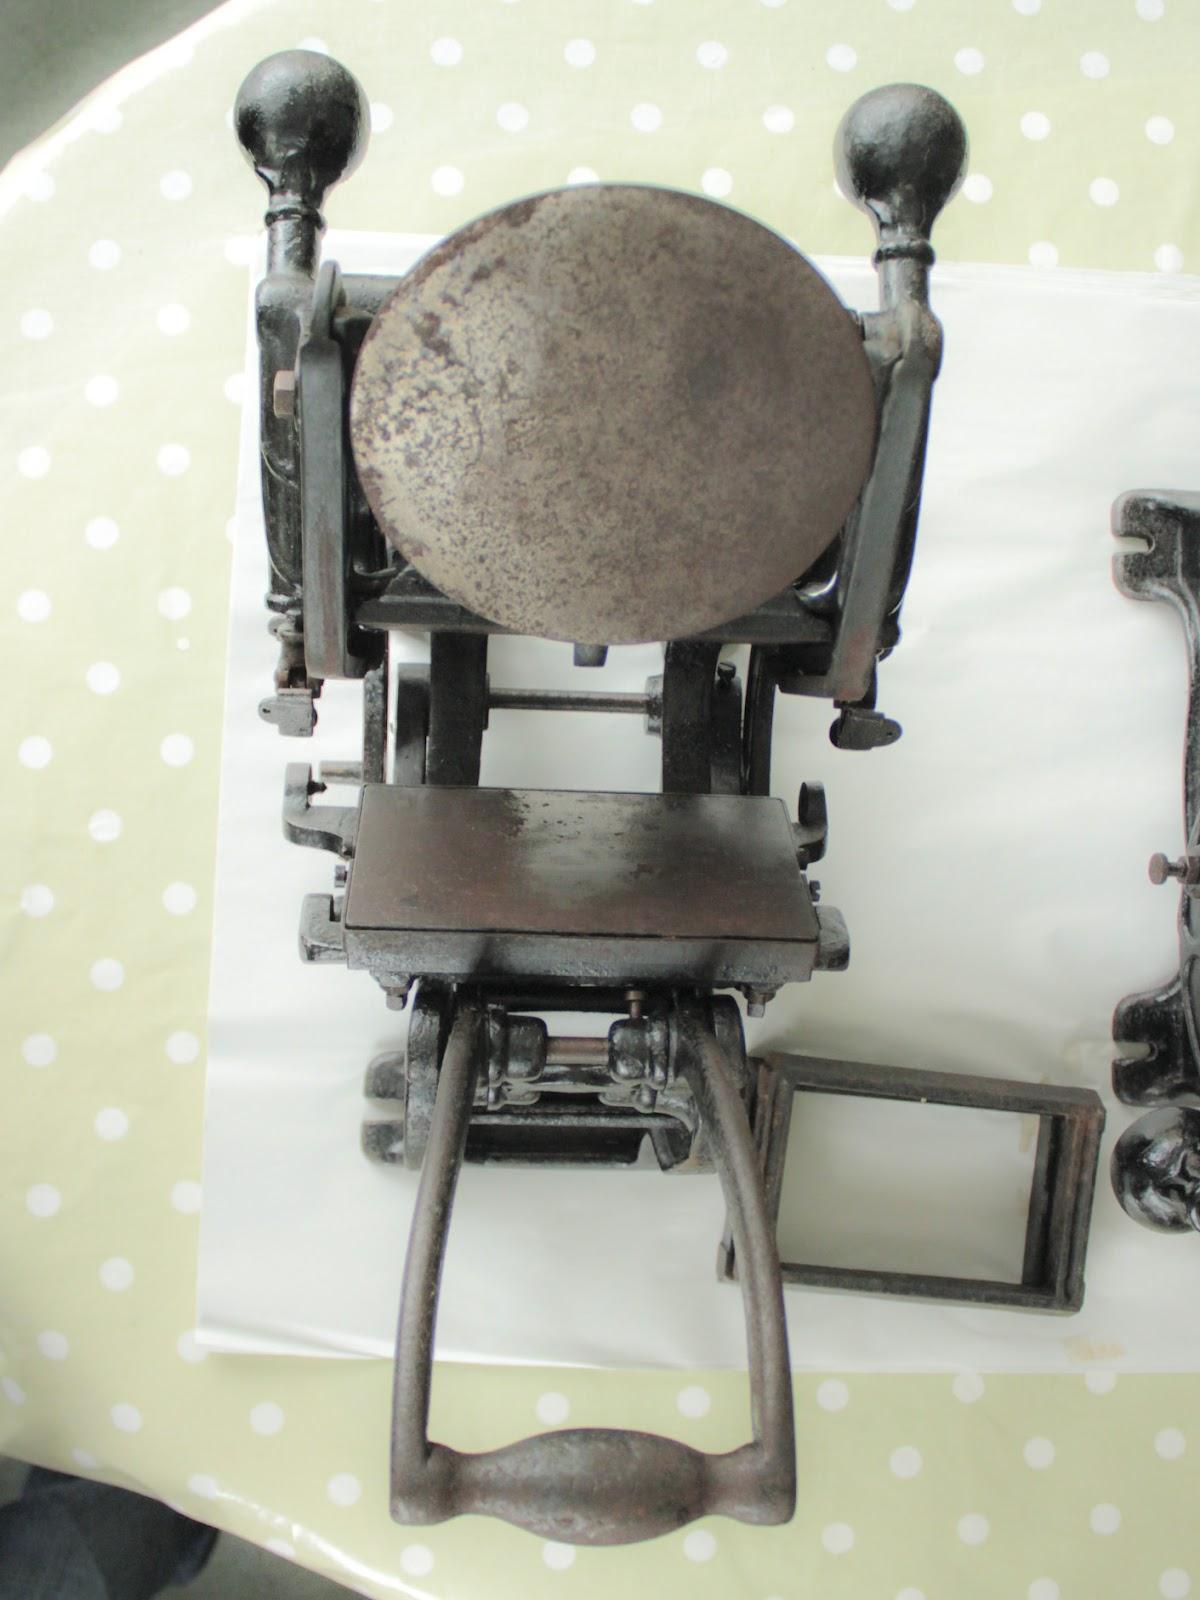 3d Printed Models Hk3dprint Model Printing Gutenberg Press Diagram Gutenbergprintingpressjpg Crazy Bear Studio Blog No 1 The